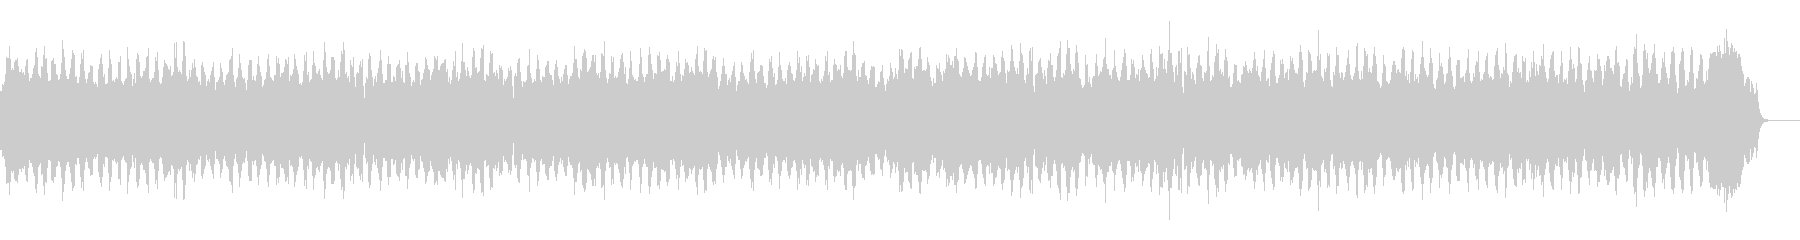 Majestic ballad / orchestra's unreproduced waveform